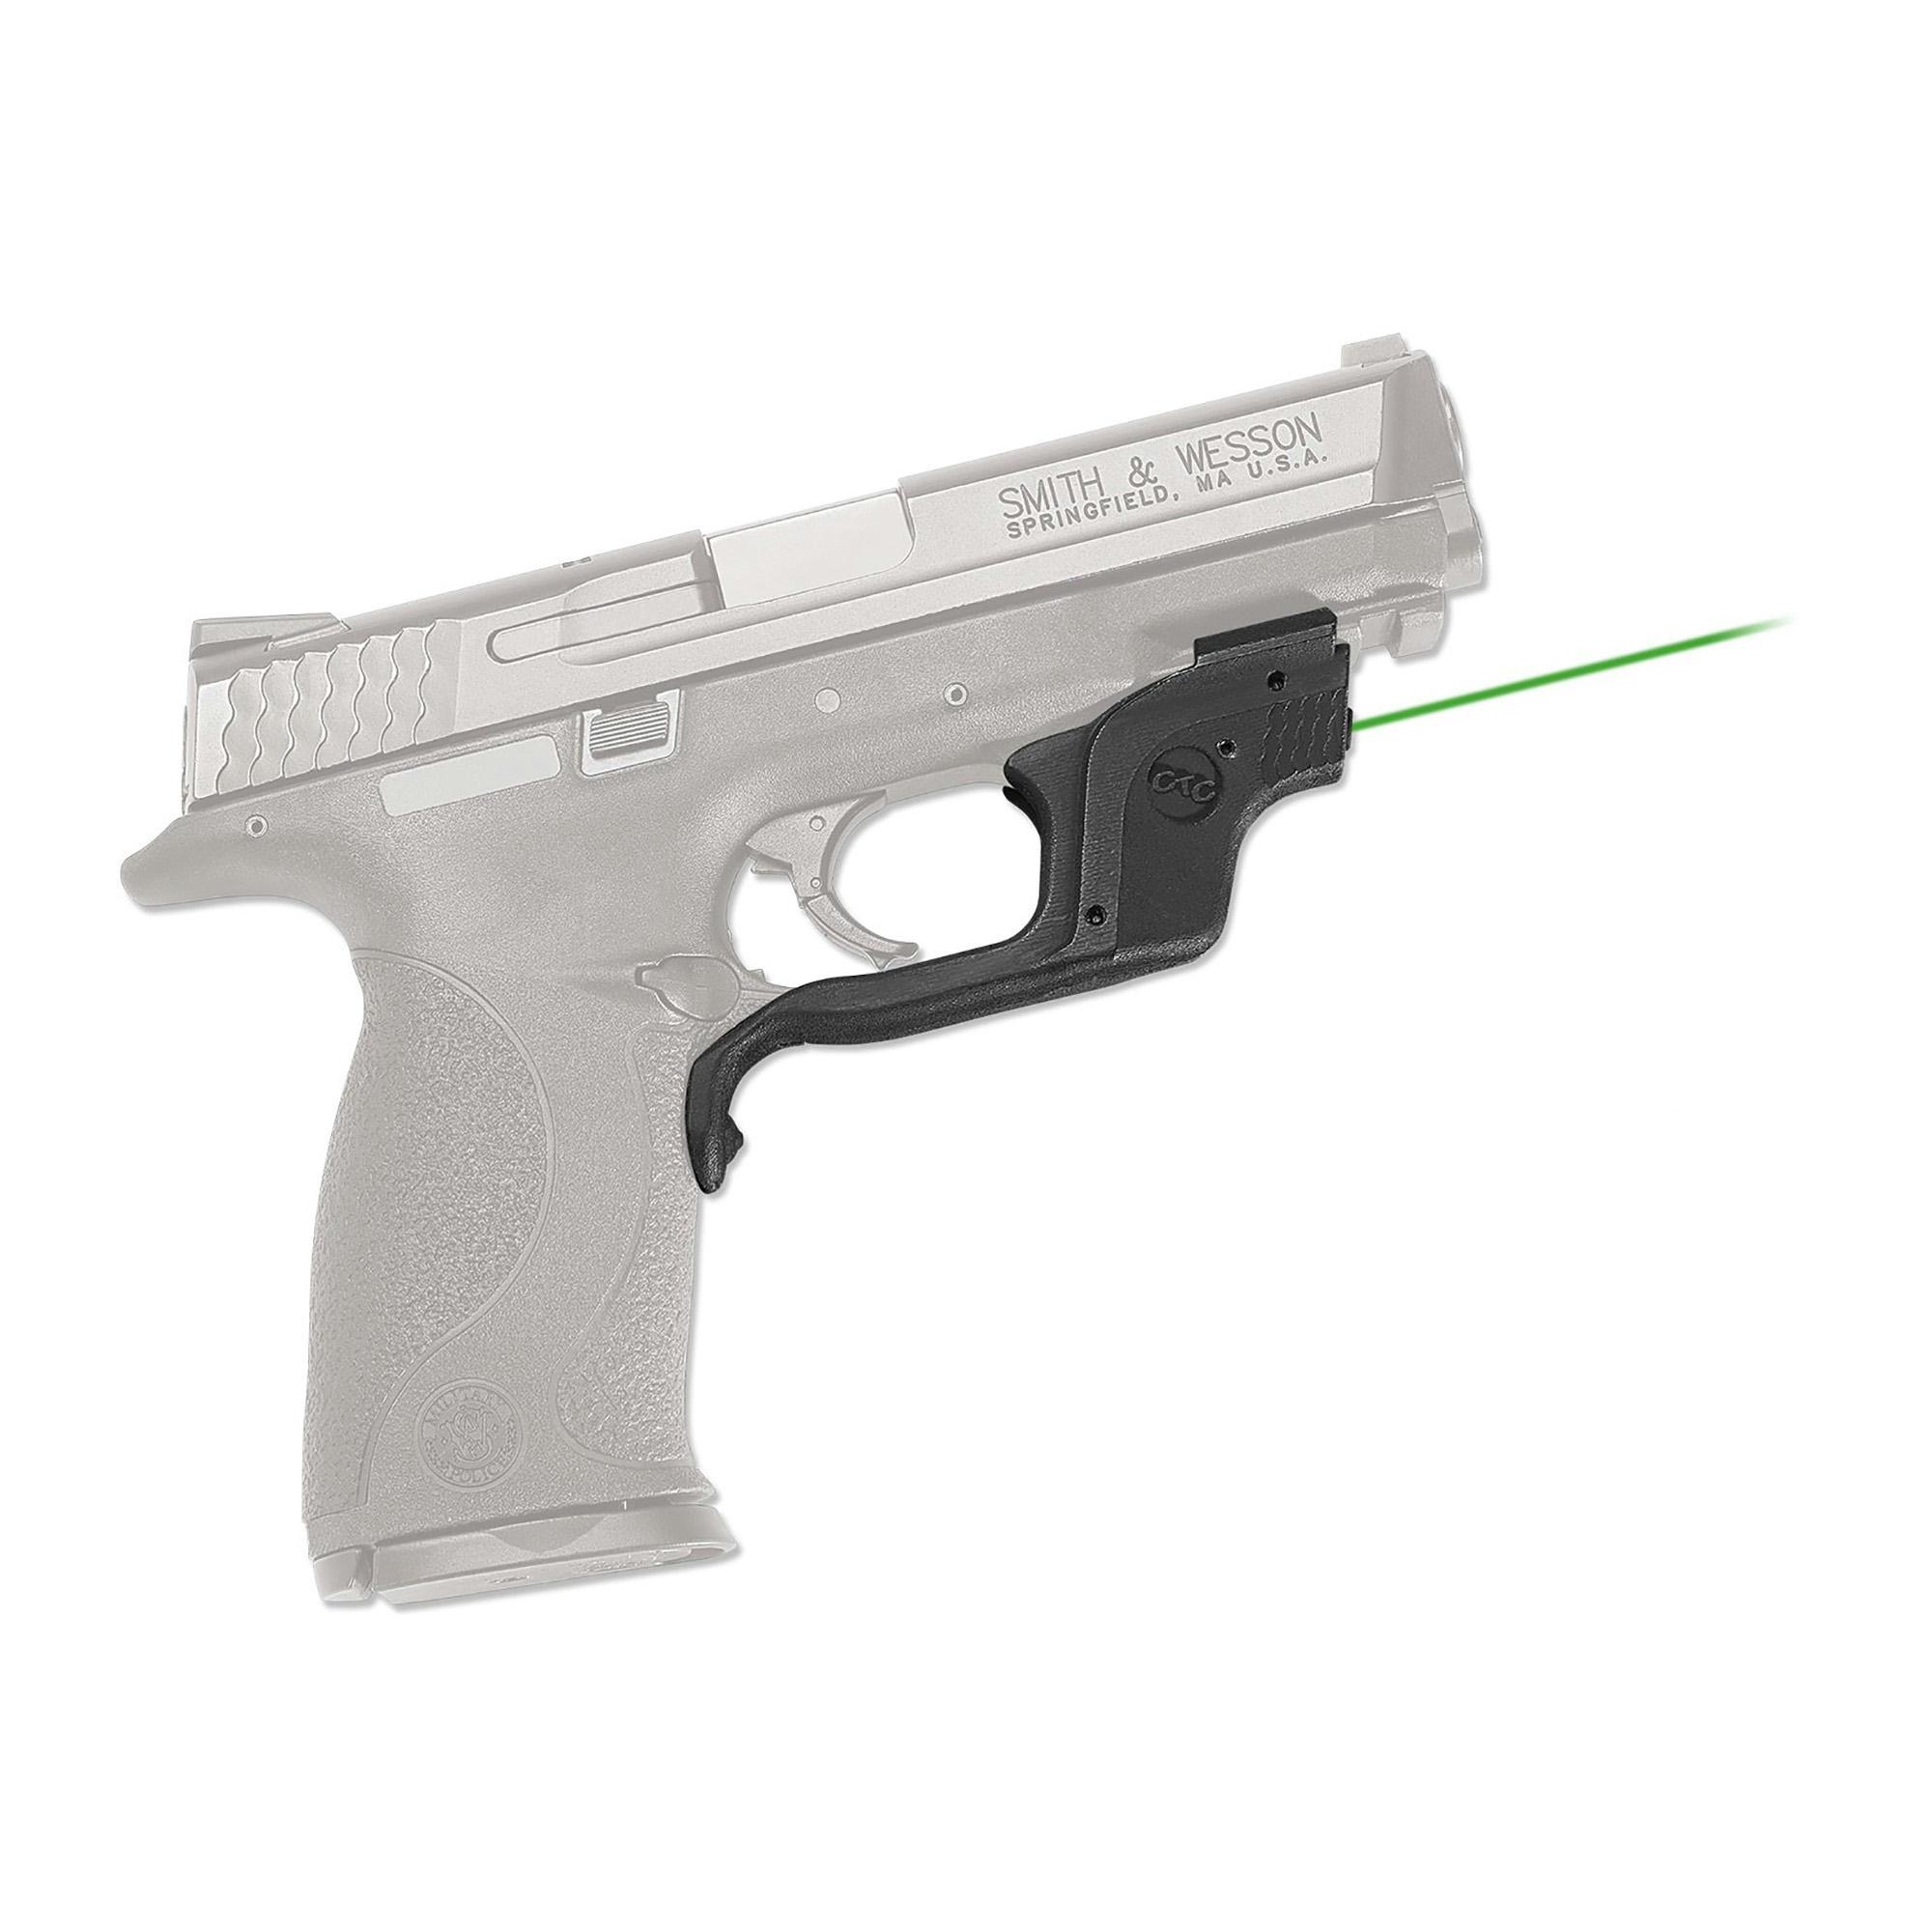 Crimson Trace Laserguard for S&W M&P Series Pistols